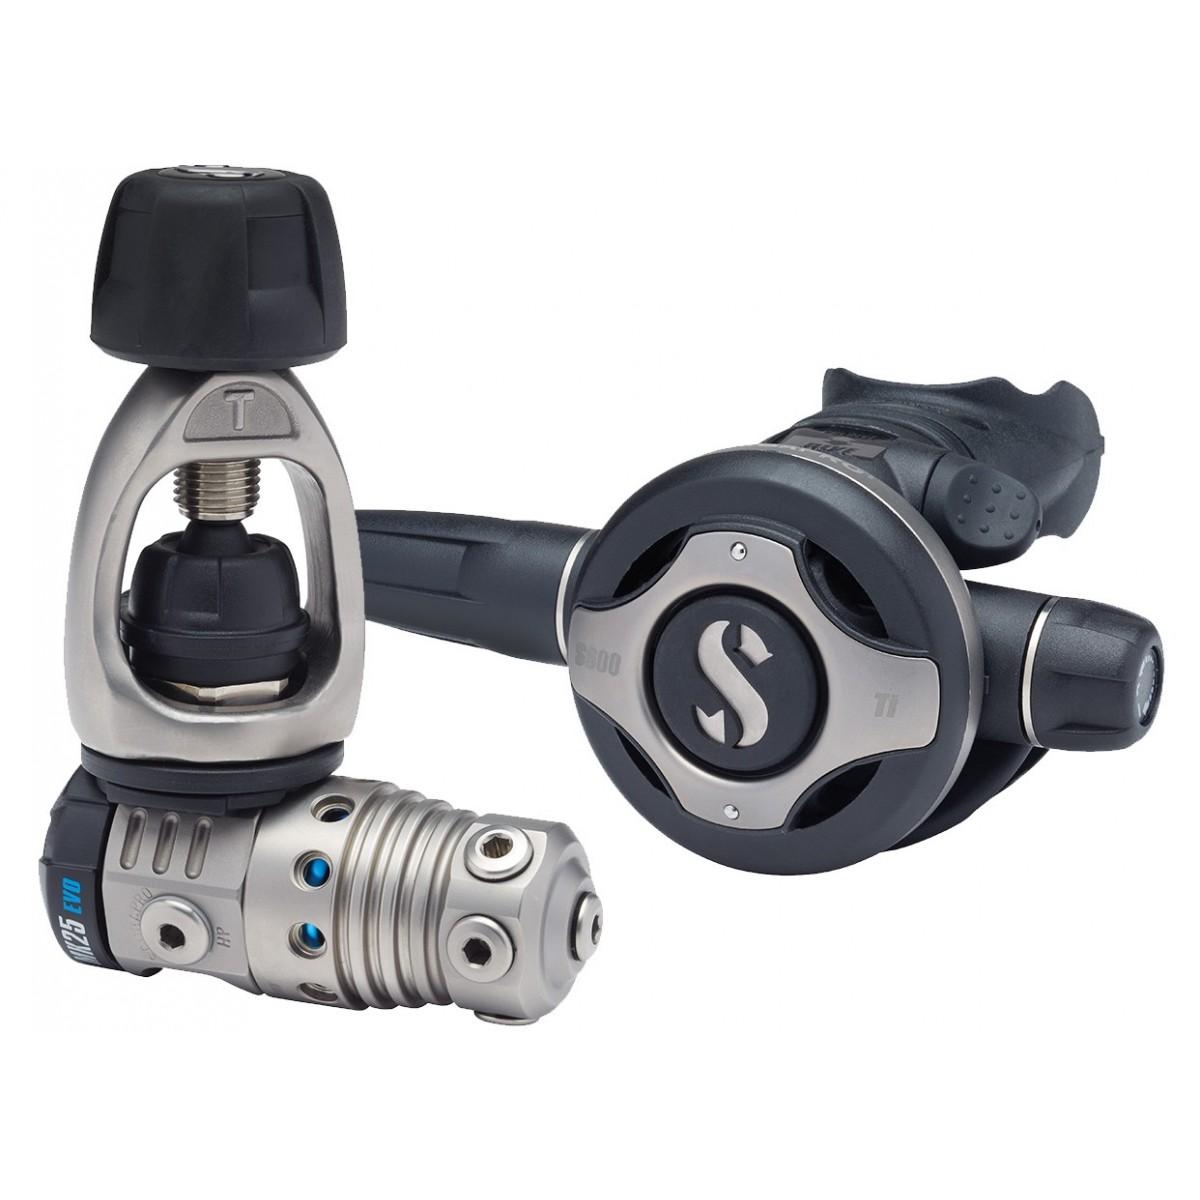 Scubapro MK25T EVO /S620 Titanium Regulator-Din